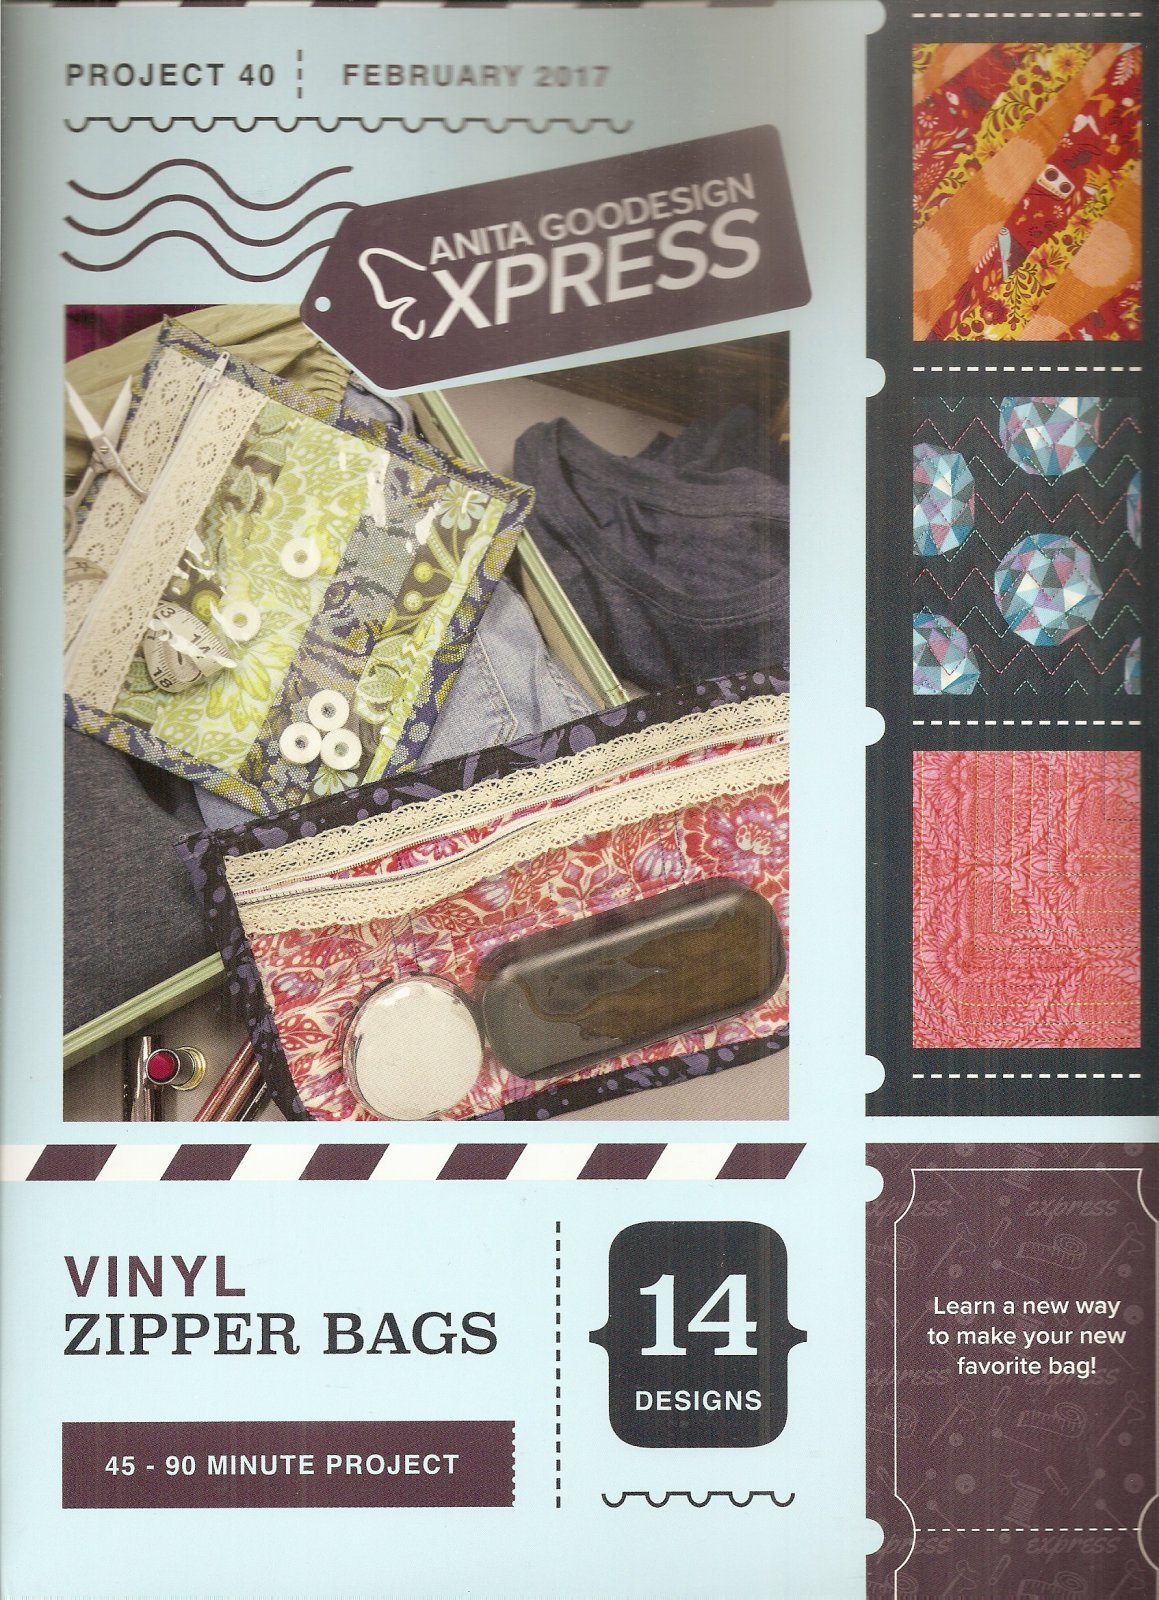 Anita Goodesign Express Vinyl Zipper Bags 079673011415